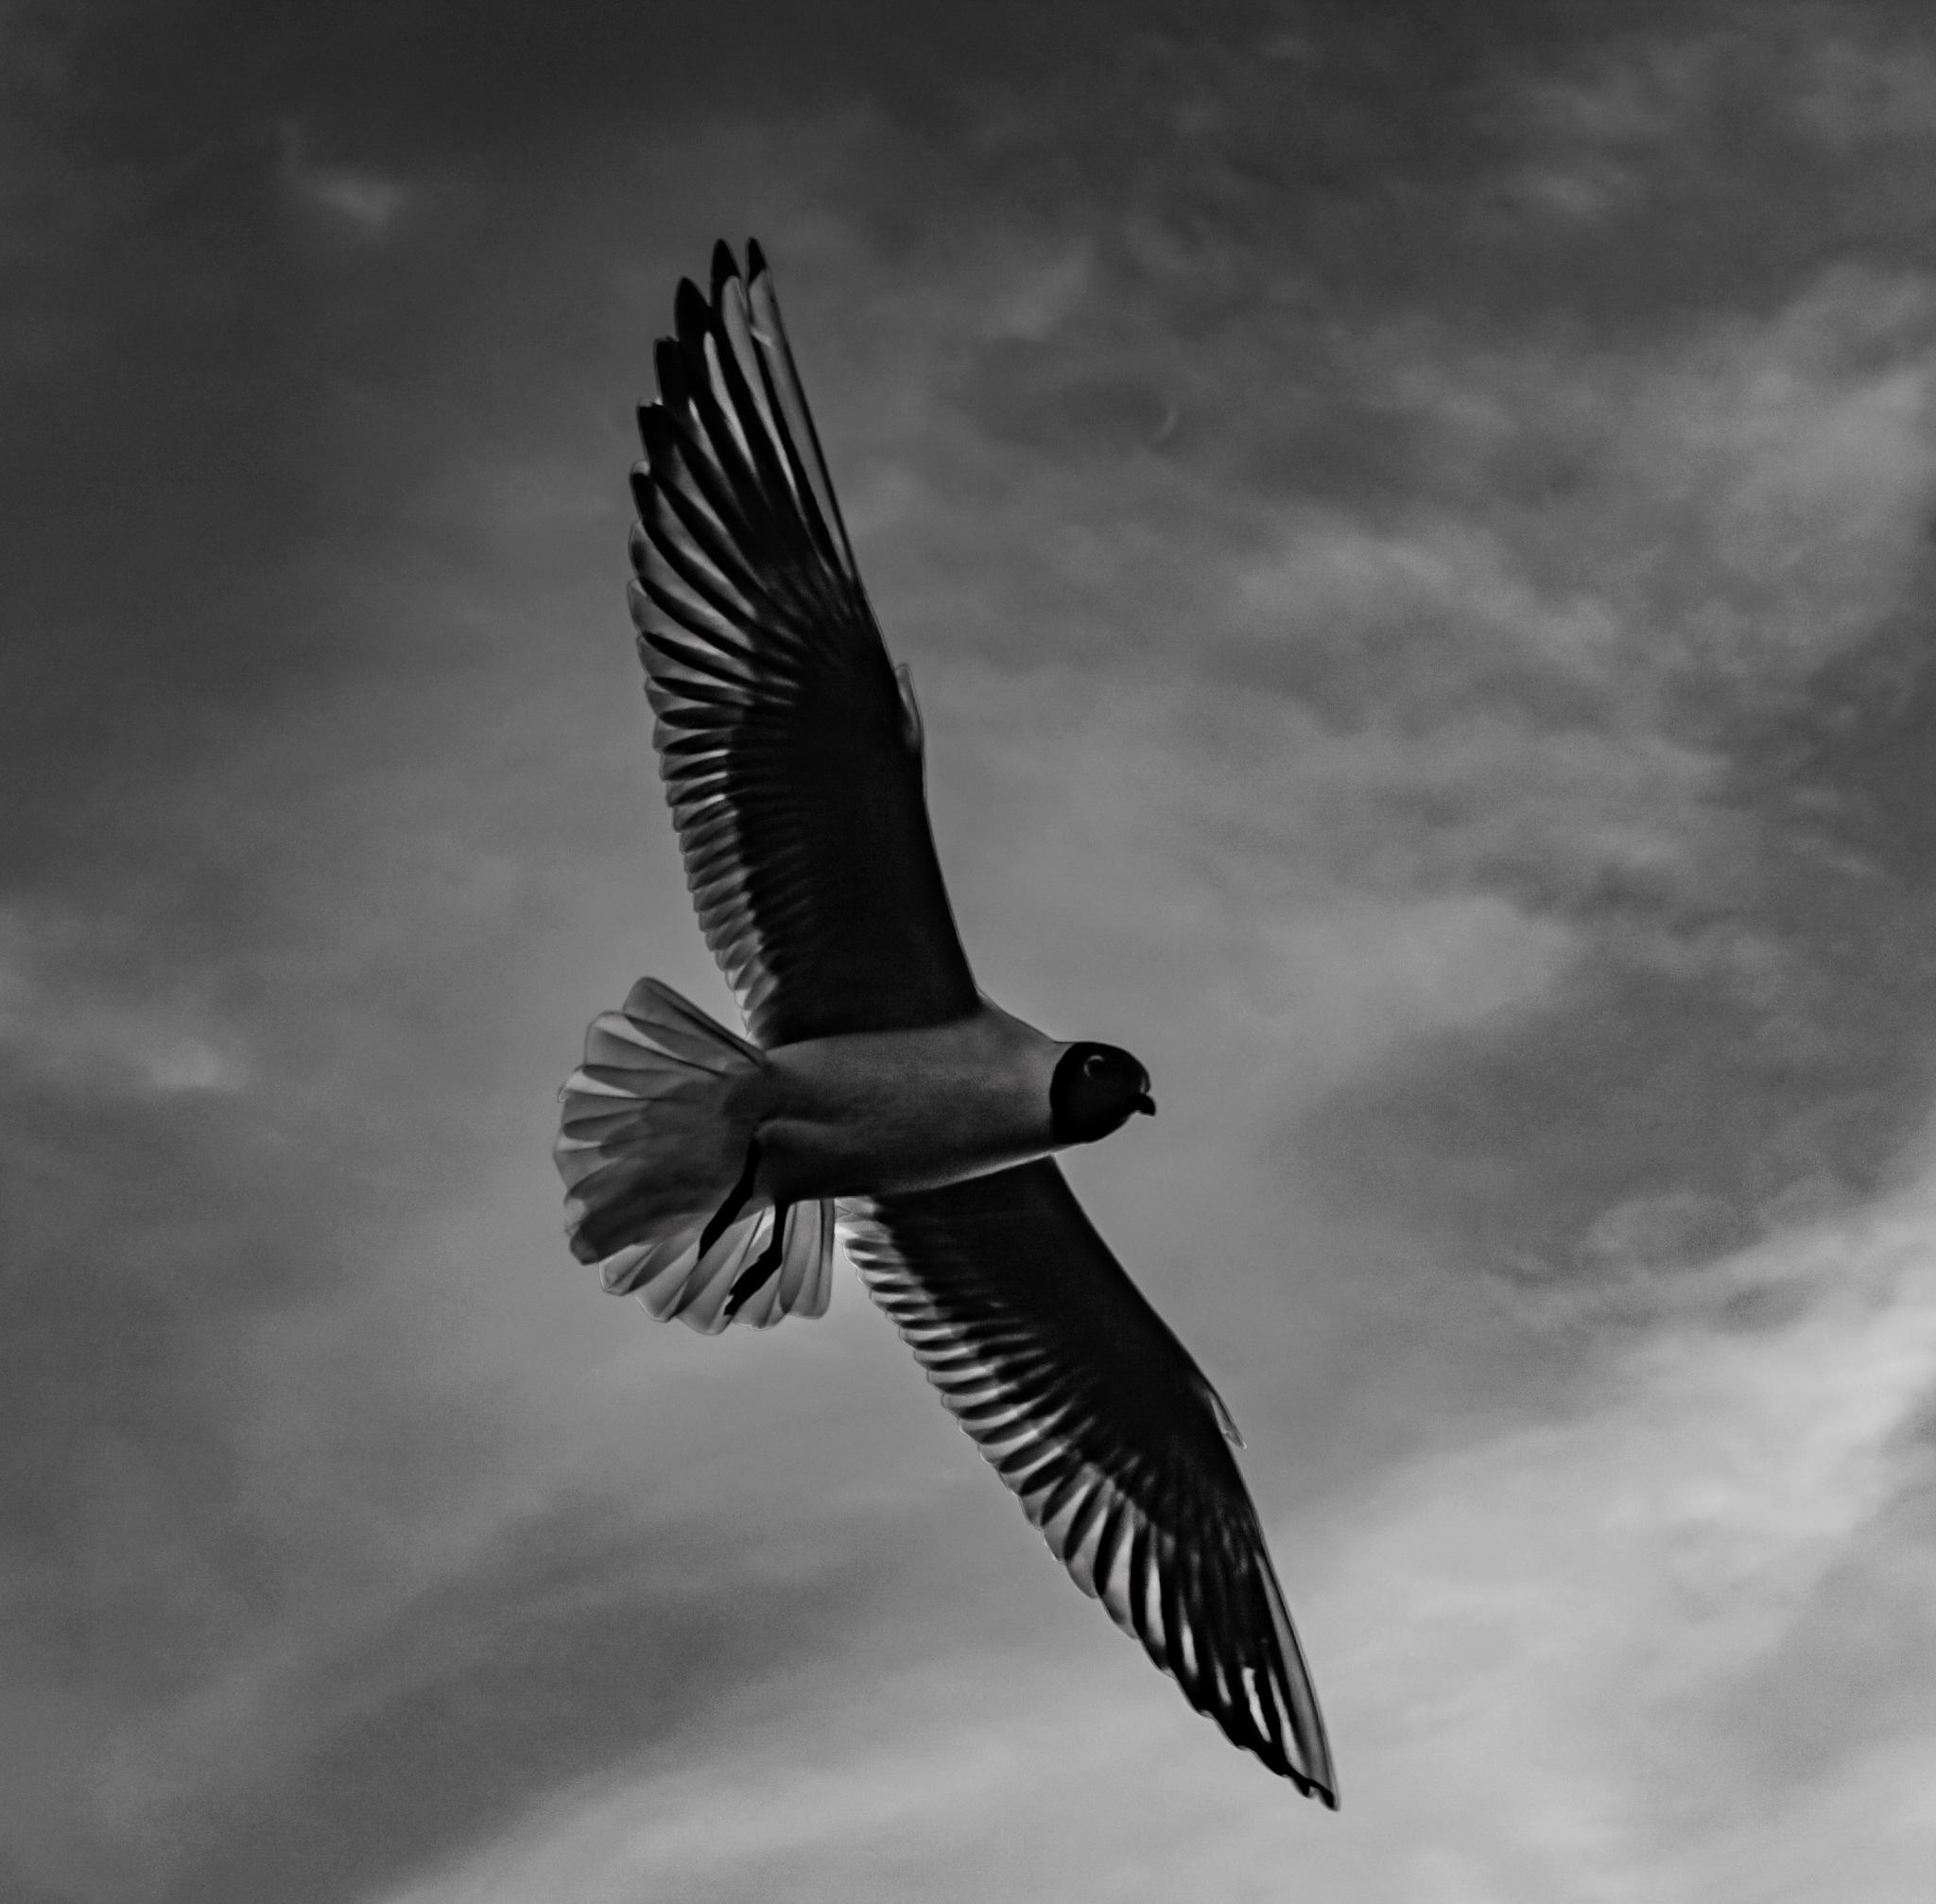 Alone in sky by juglinieksx